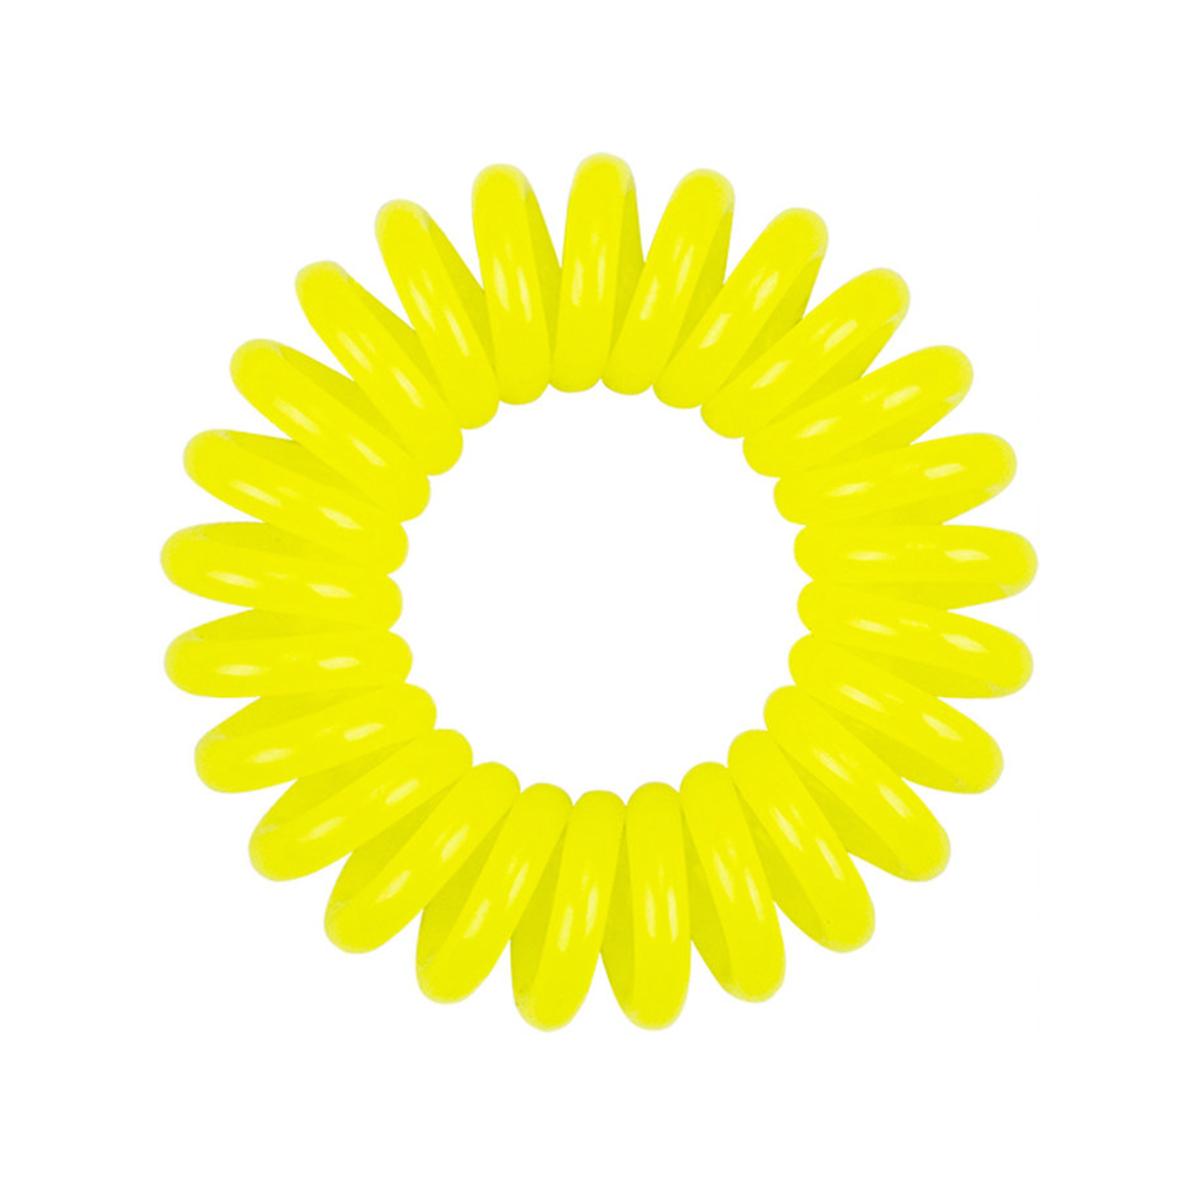 Spiral_Yellow1